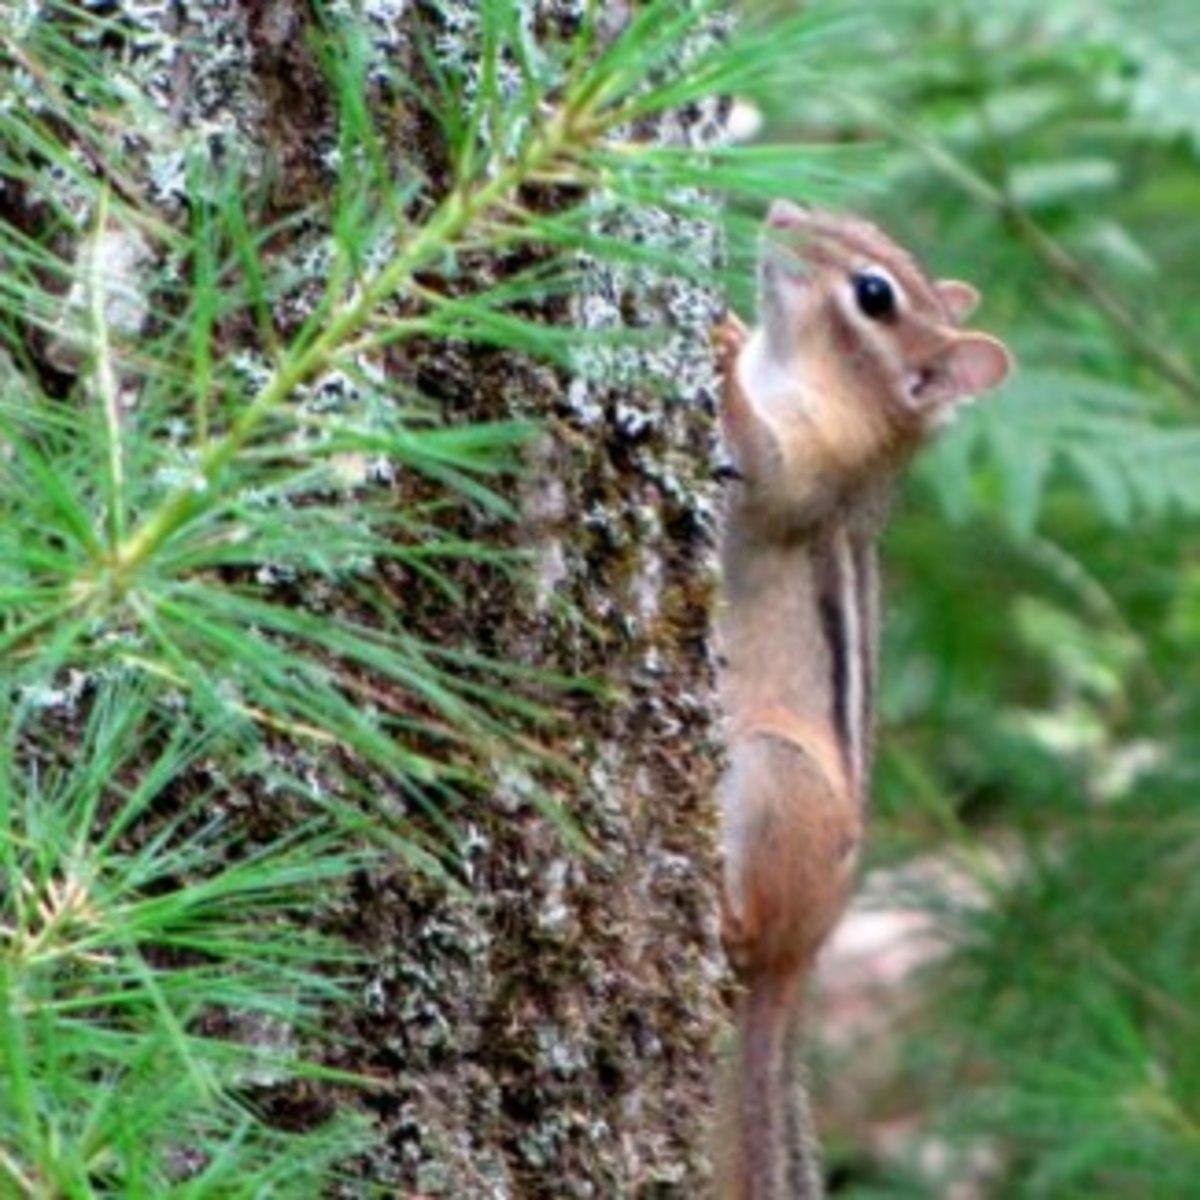 Chipmunk climbing a tree.